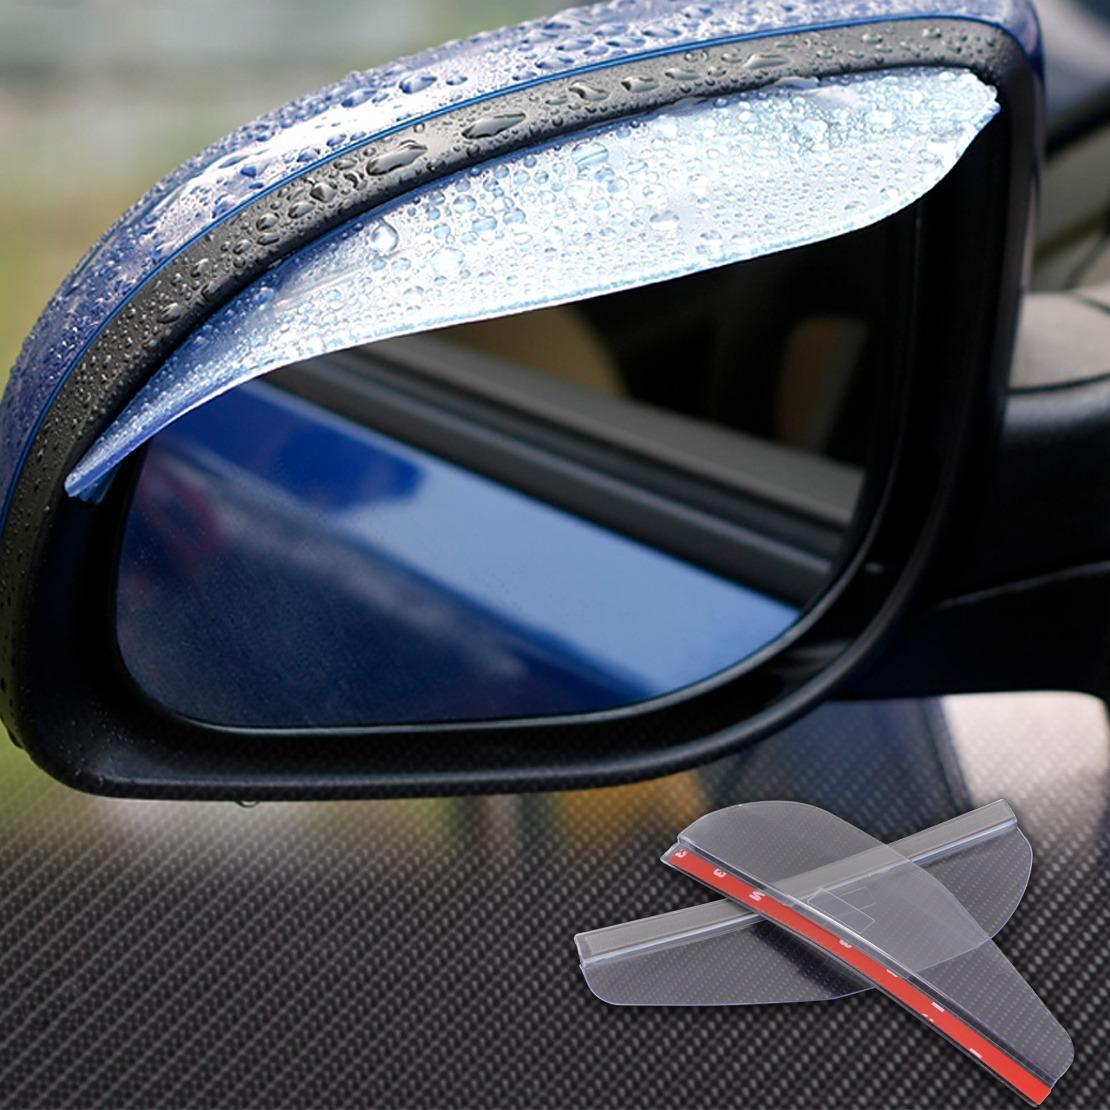 Pelindung Spion Mobil Air Hujan Kaca Mika Anti Air Kotor Cermin Car Talang Mirror Kiri Kanan